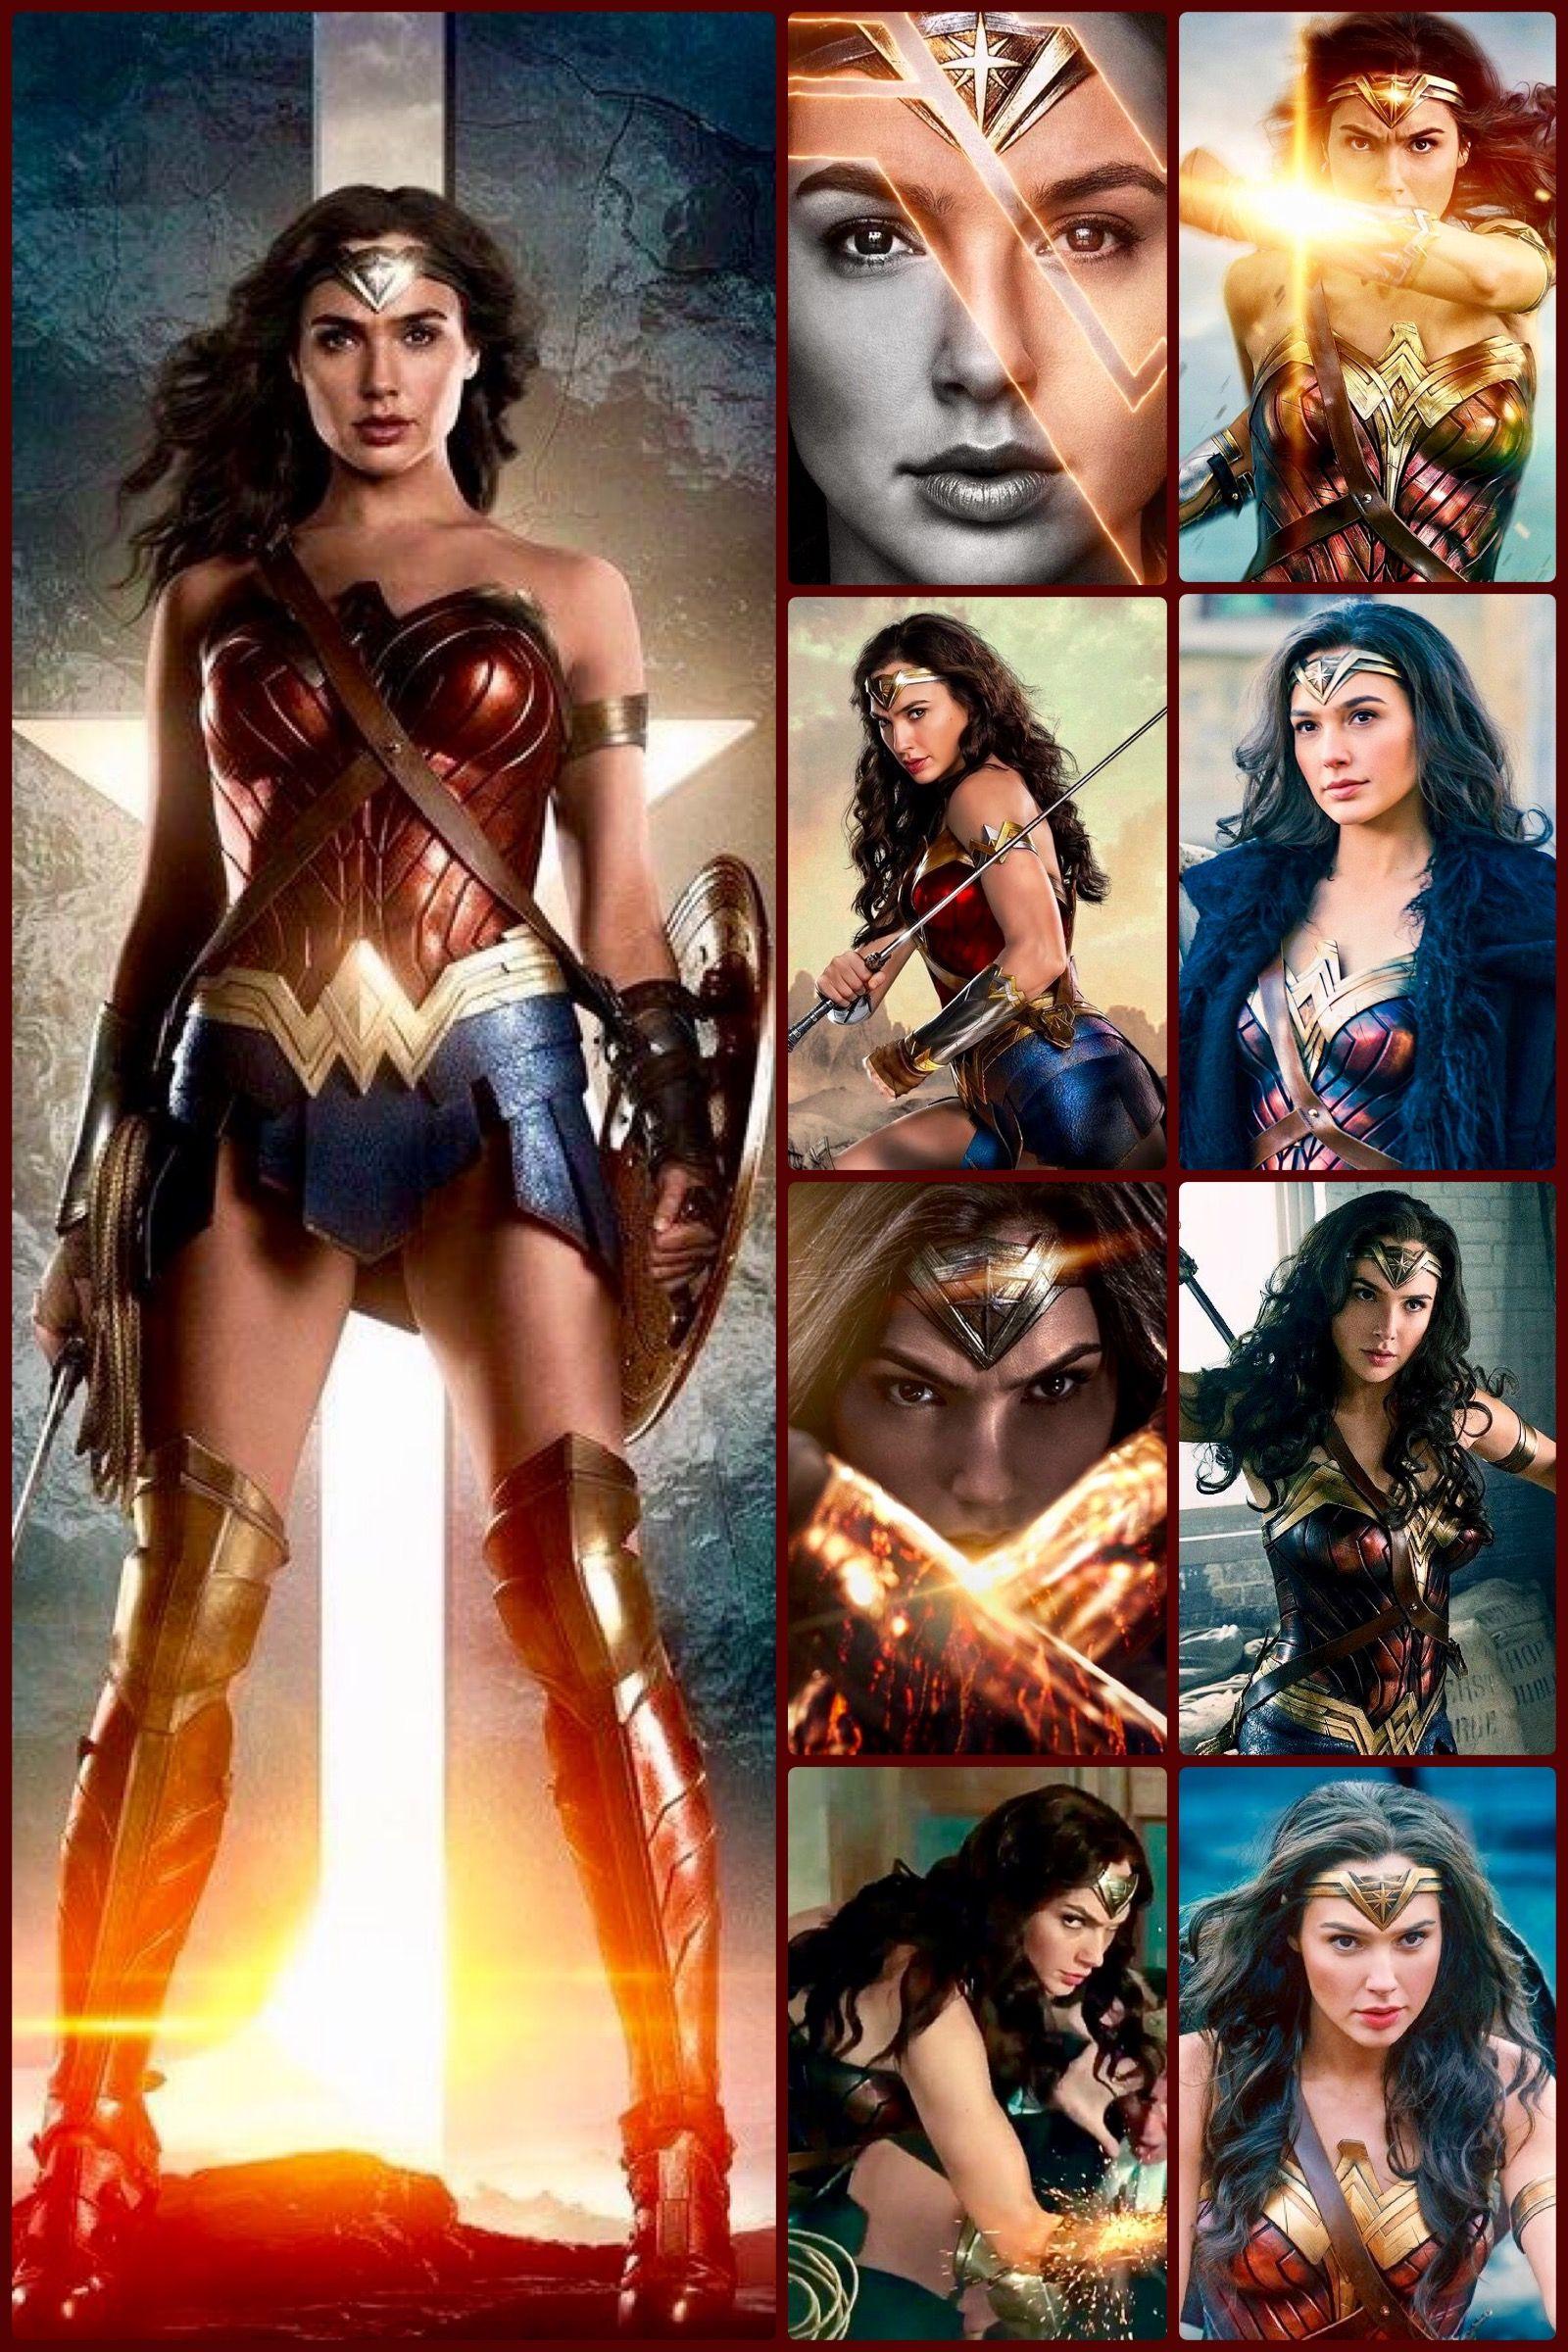 Wonderbat Wonderwoman Batman Truth Justice Truthandjustice Loveletterstobatman Dianaandbruce Wond Gal Gadot Wonder Woman Wonder Woman Wonder Woman Art